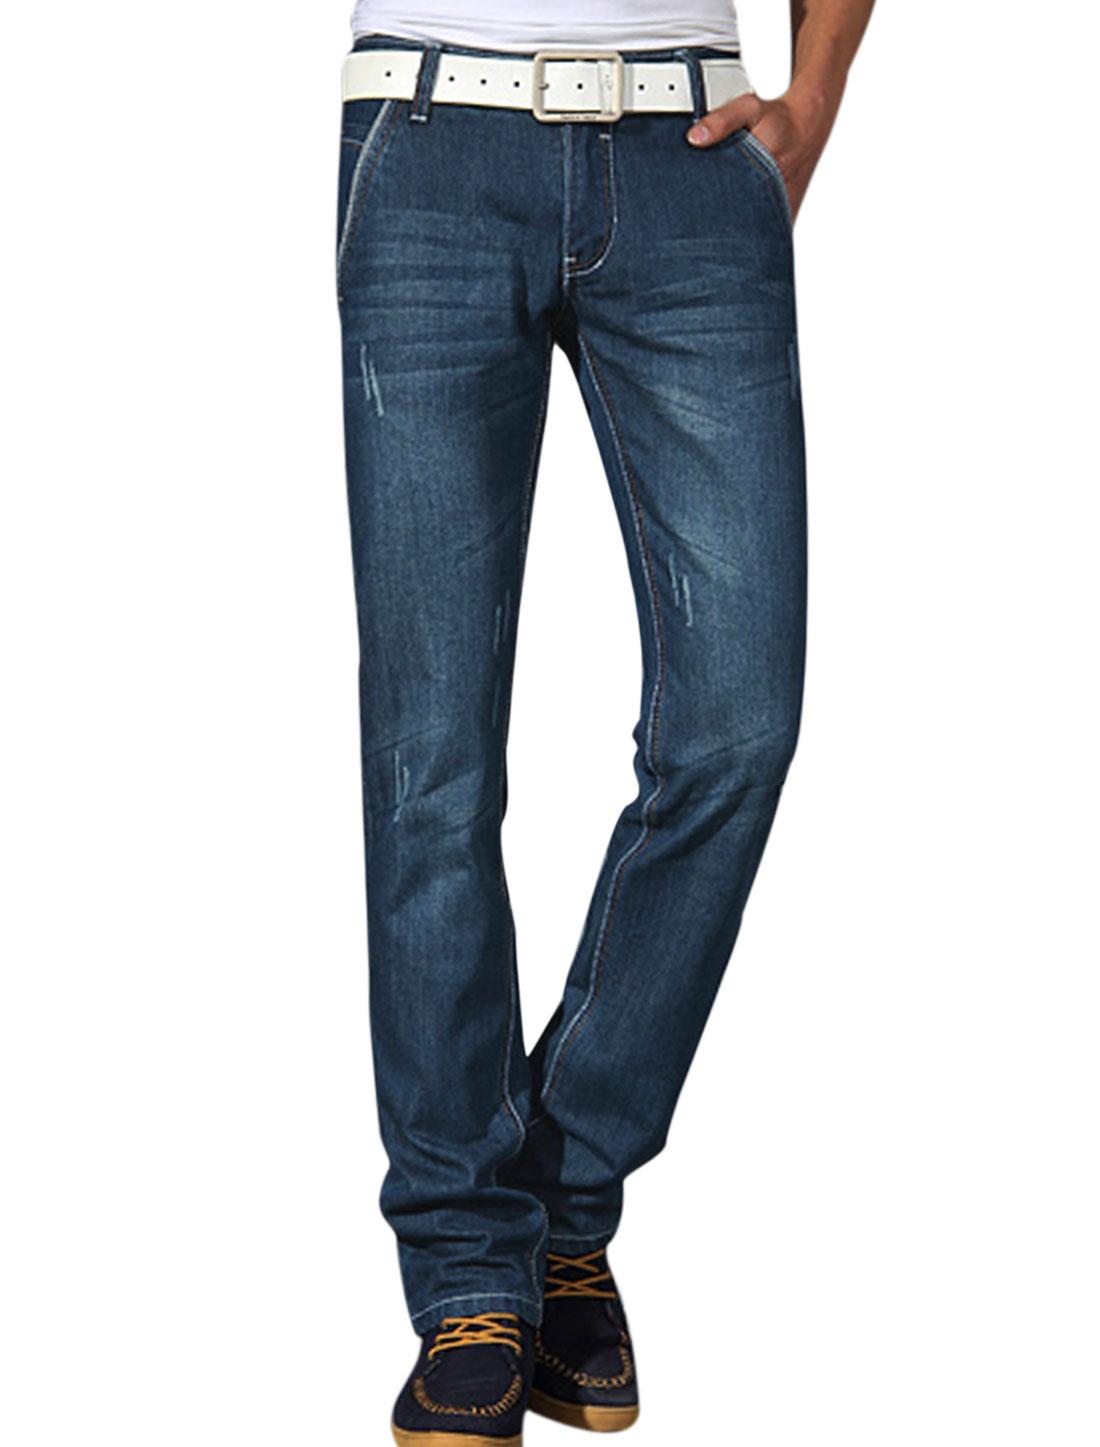 Men NEW Belt Loop Zip Fly One Button Up Leisure Jeans Dark Blue W34